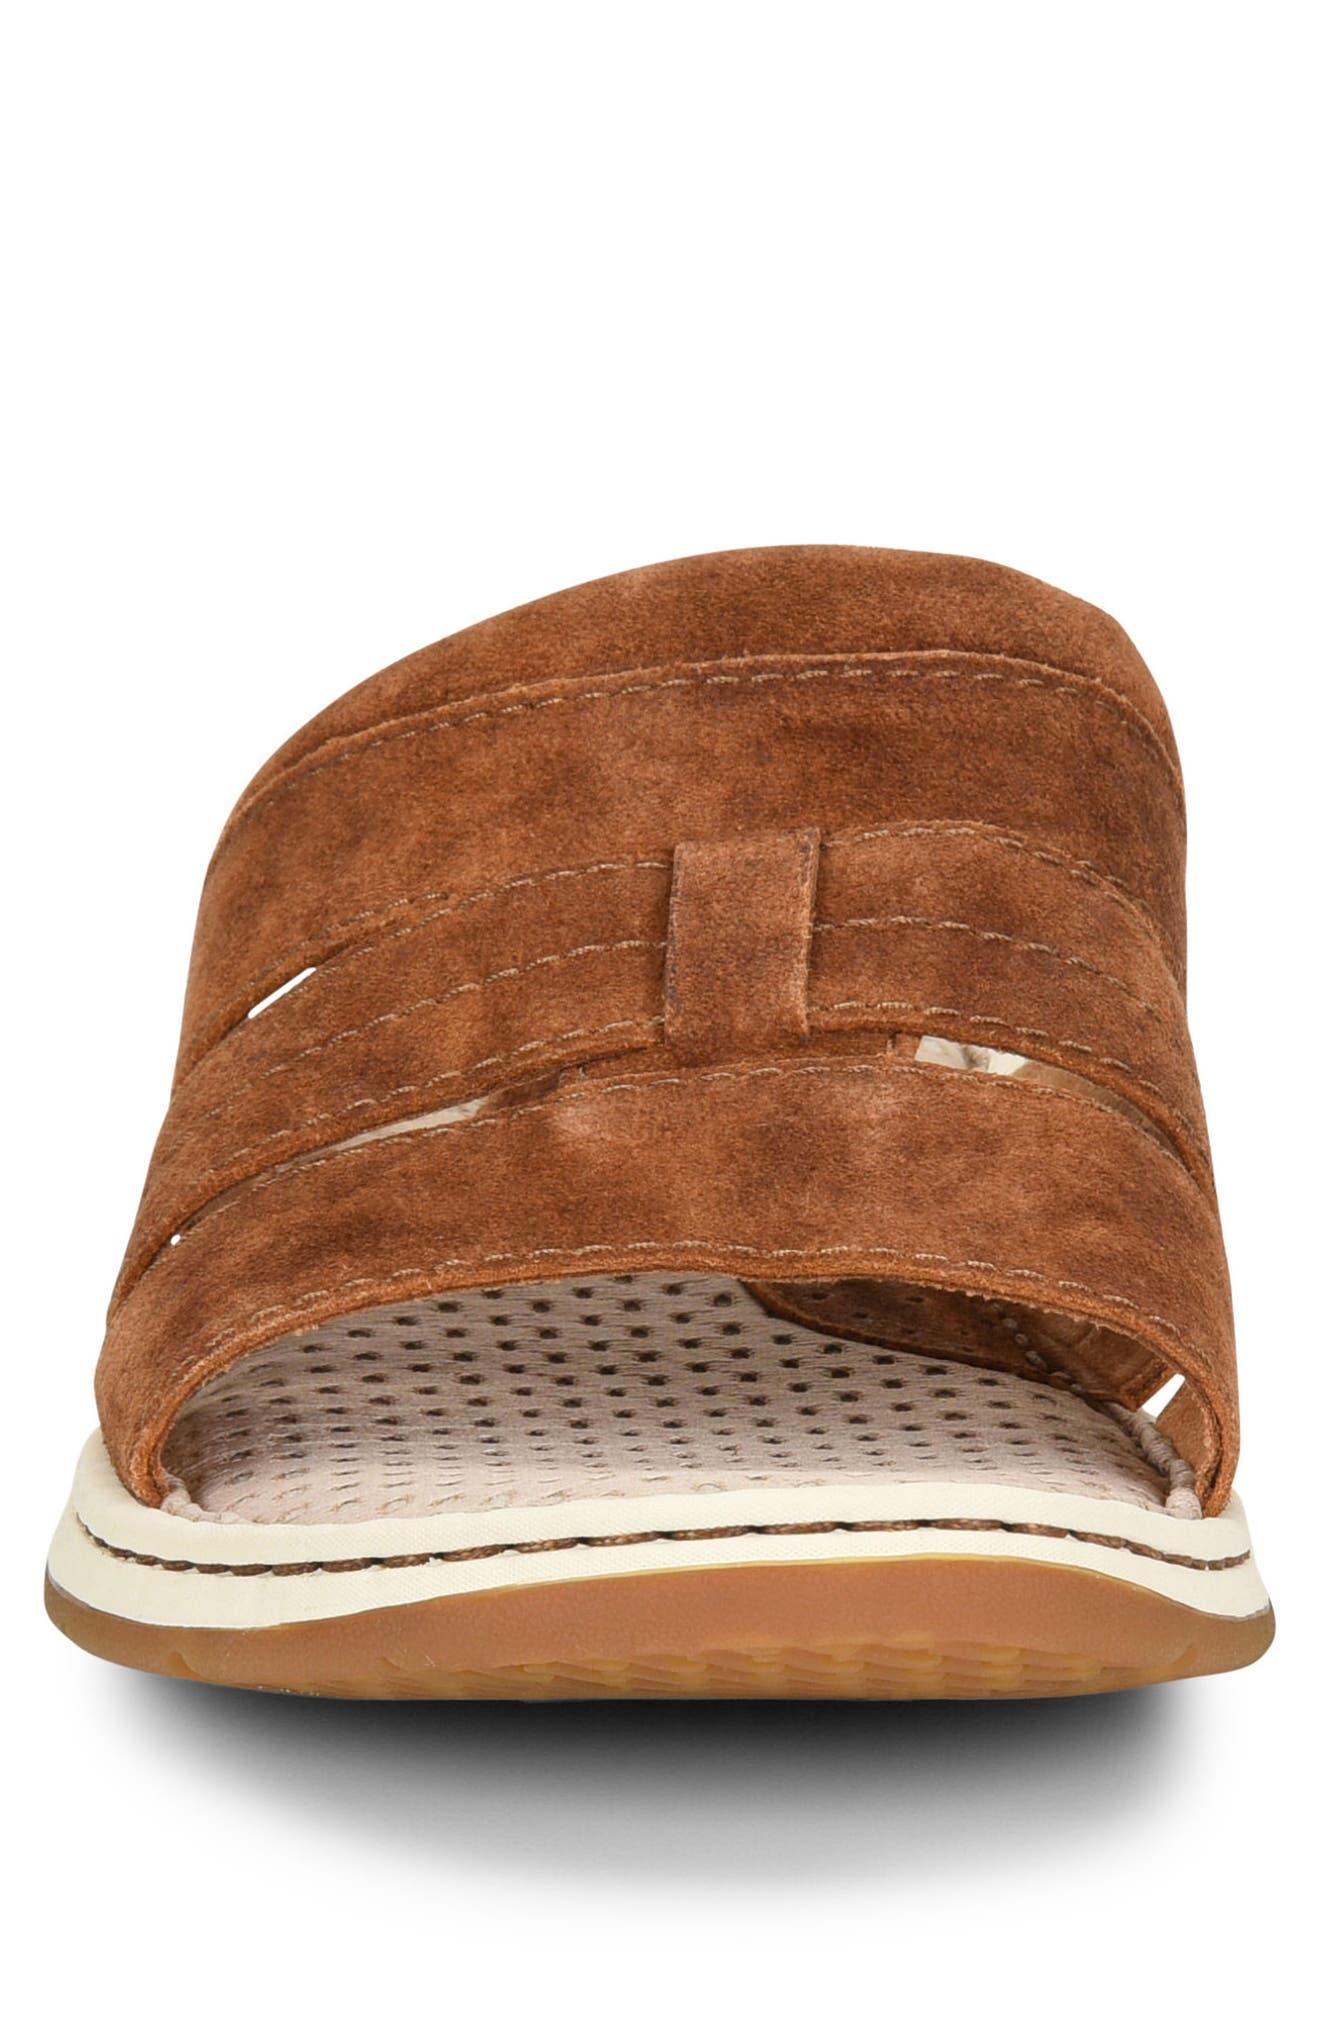 Sail Slide Sandal,                             Alternate thumbnail 4, color,                             Rust Leather